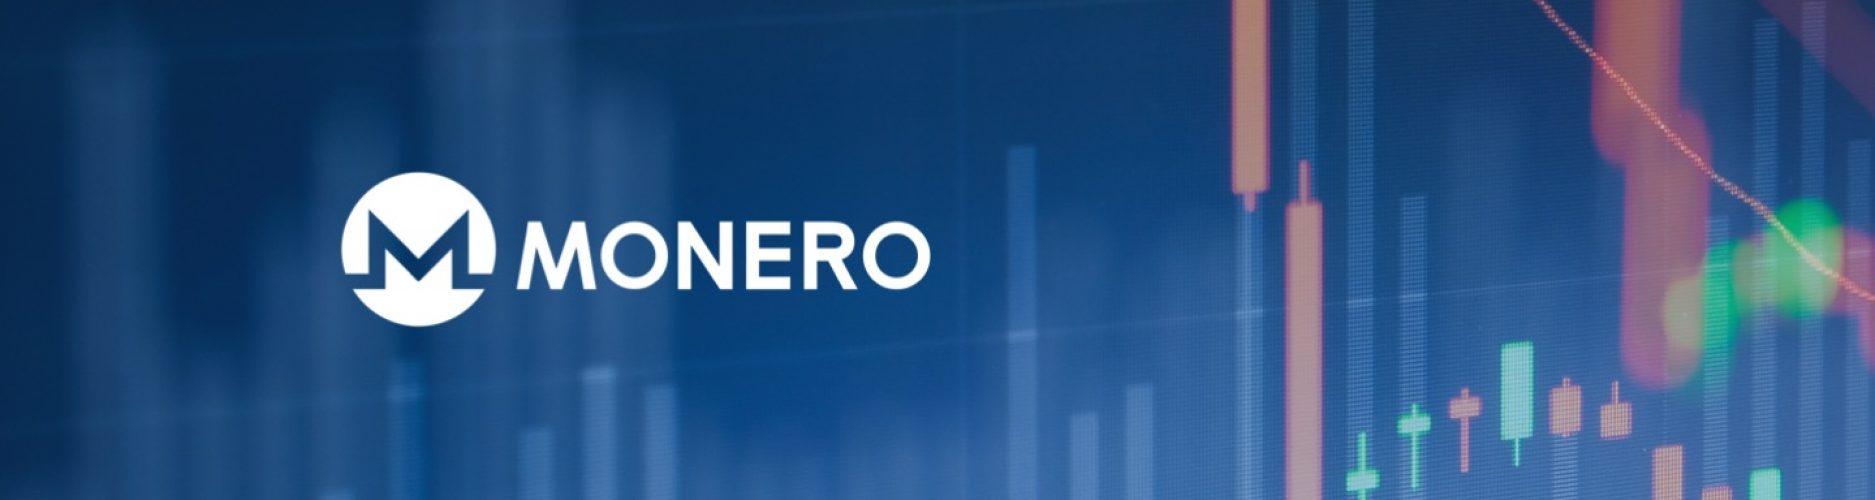 logo-monero-trading-8675